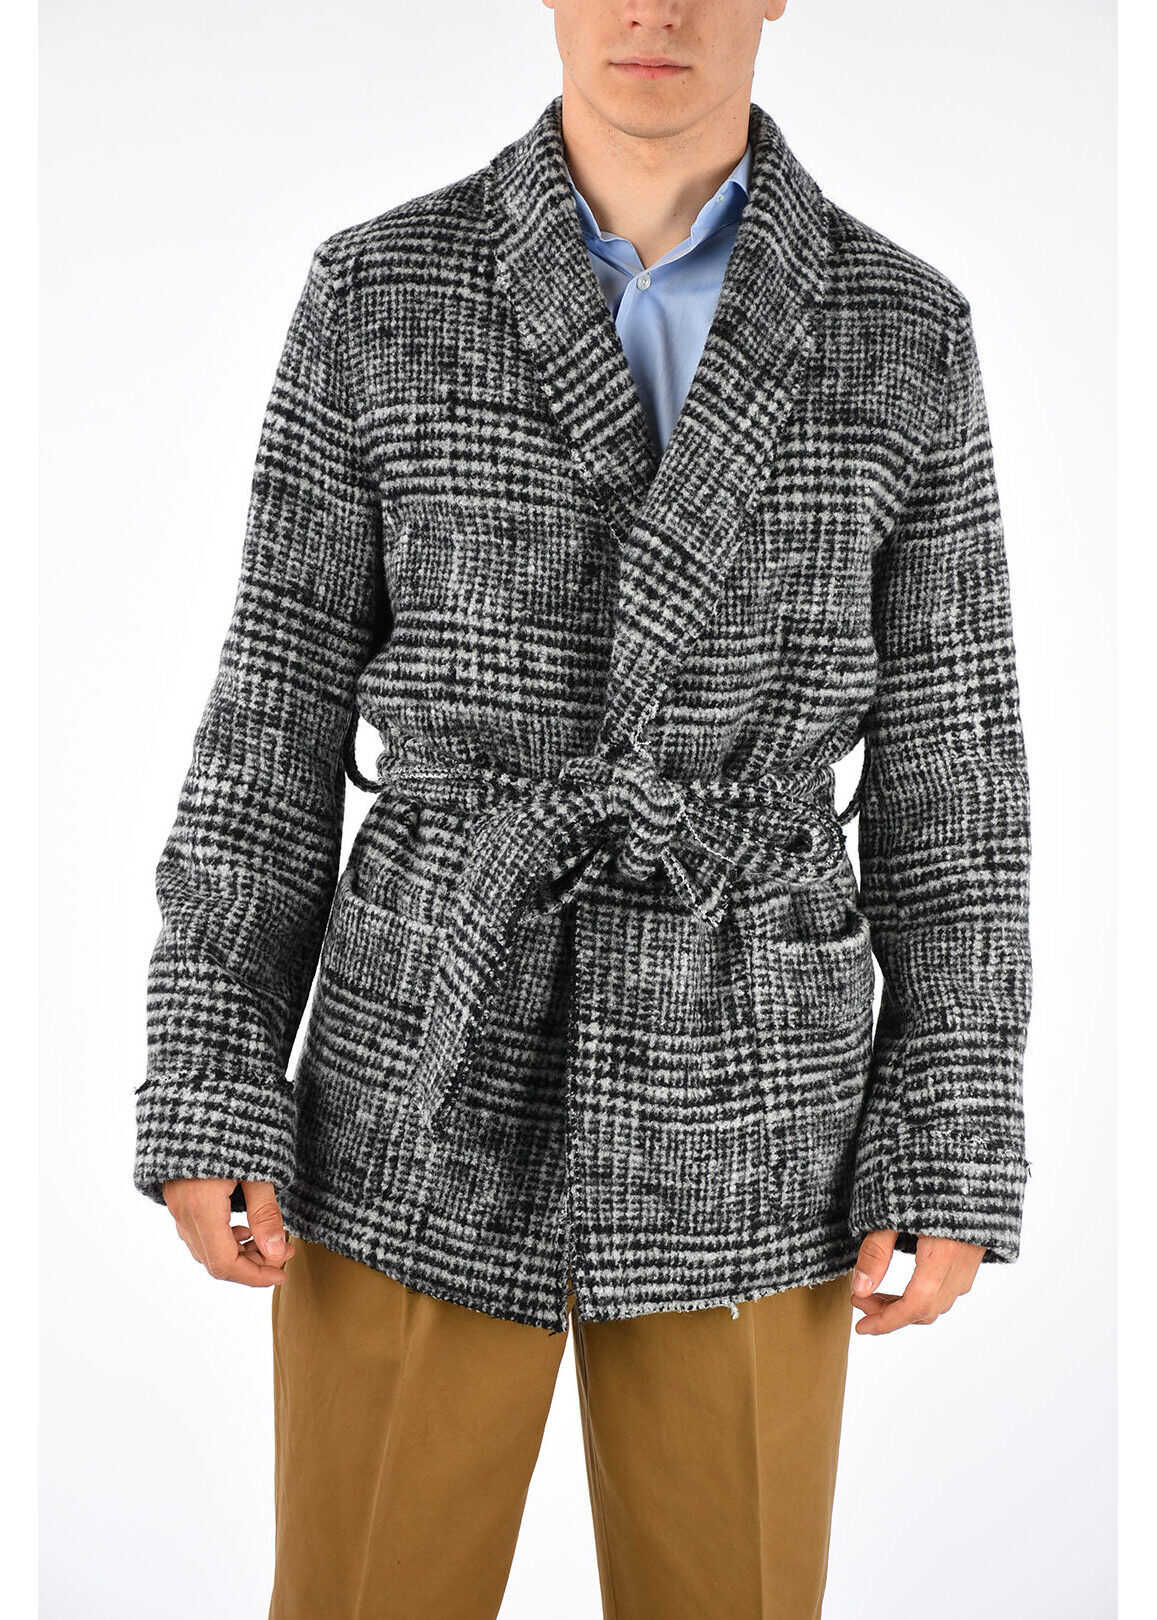 Dolce & Gabbana Wool Blend Coat BLACK & WHITE